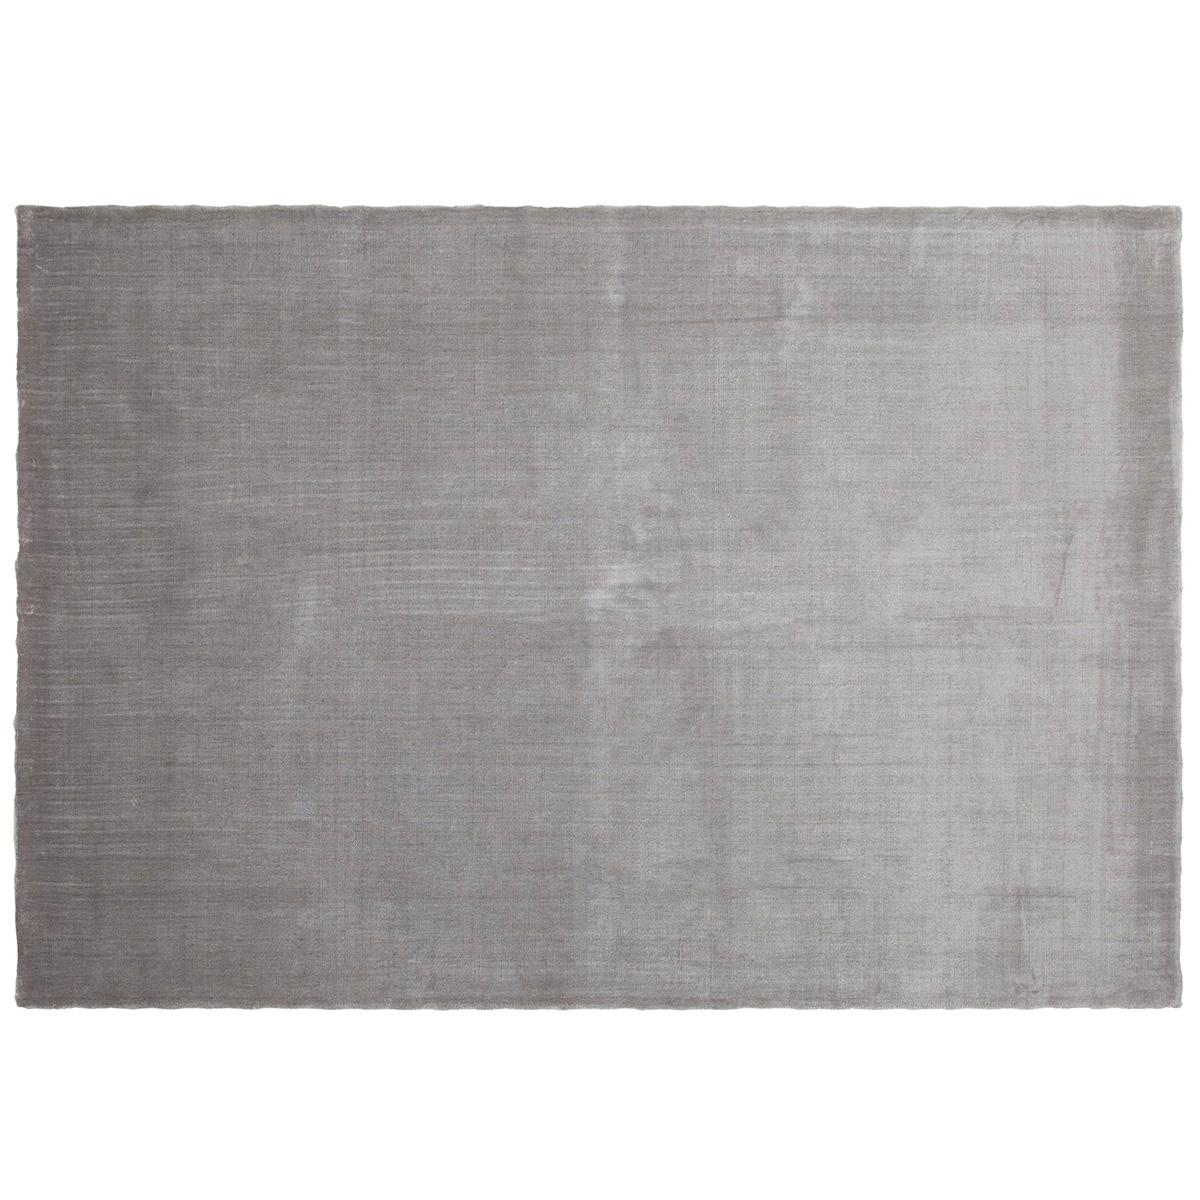 Vloerkleed Brinker Sensation Grey | 200 x 290 cm